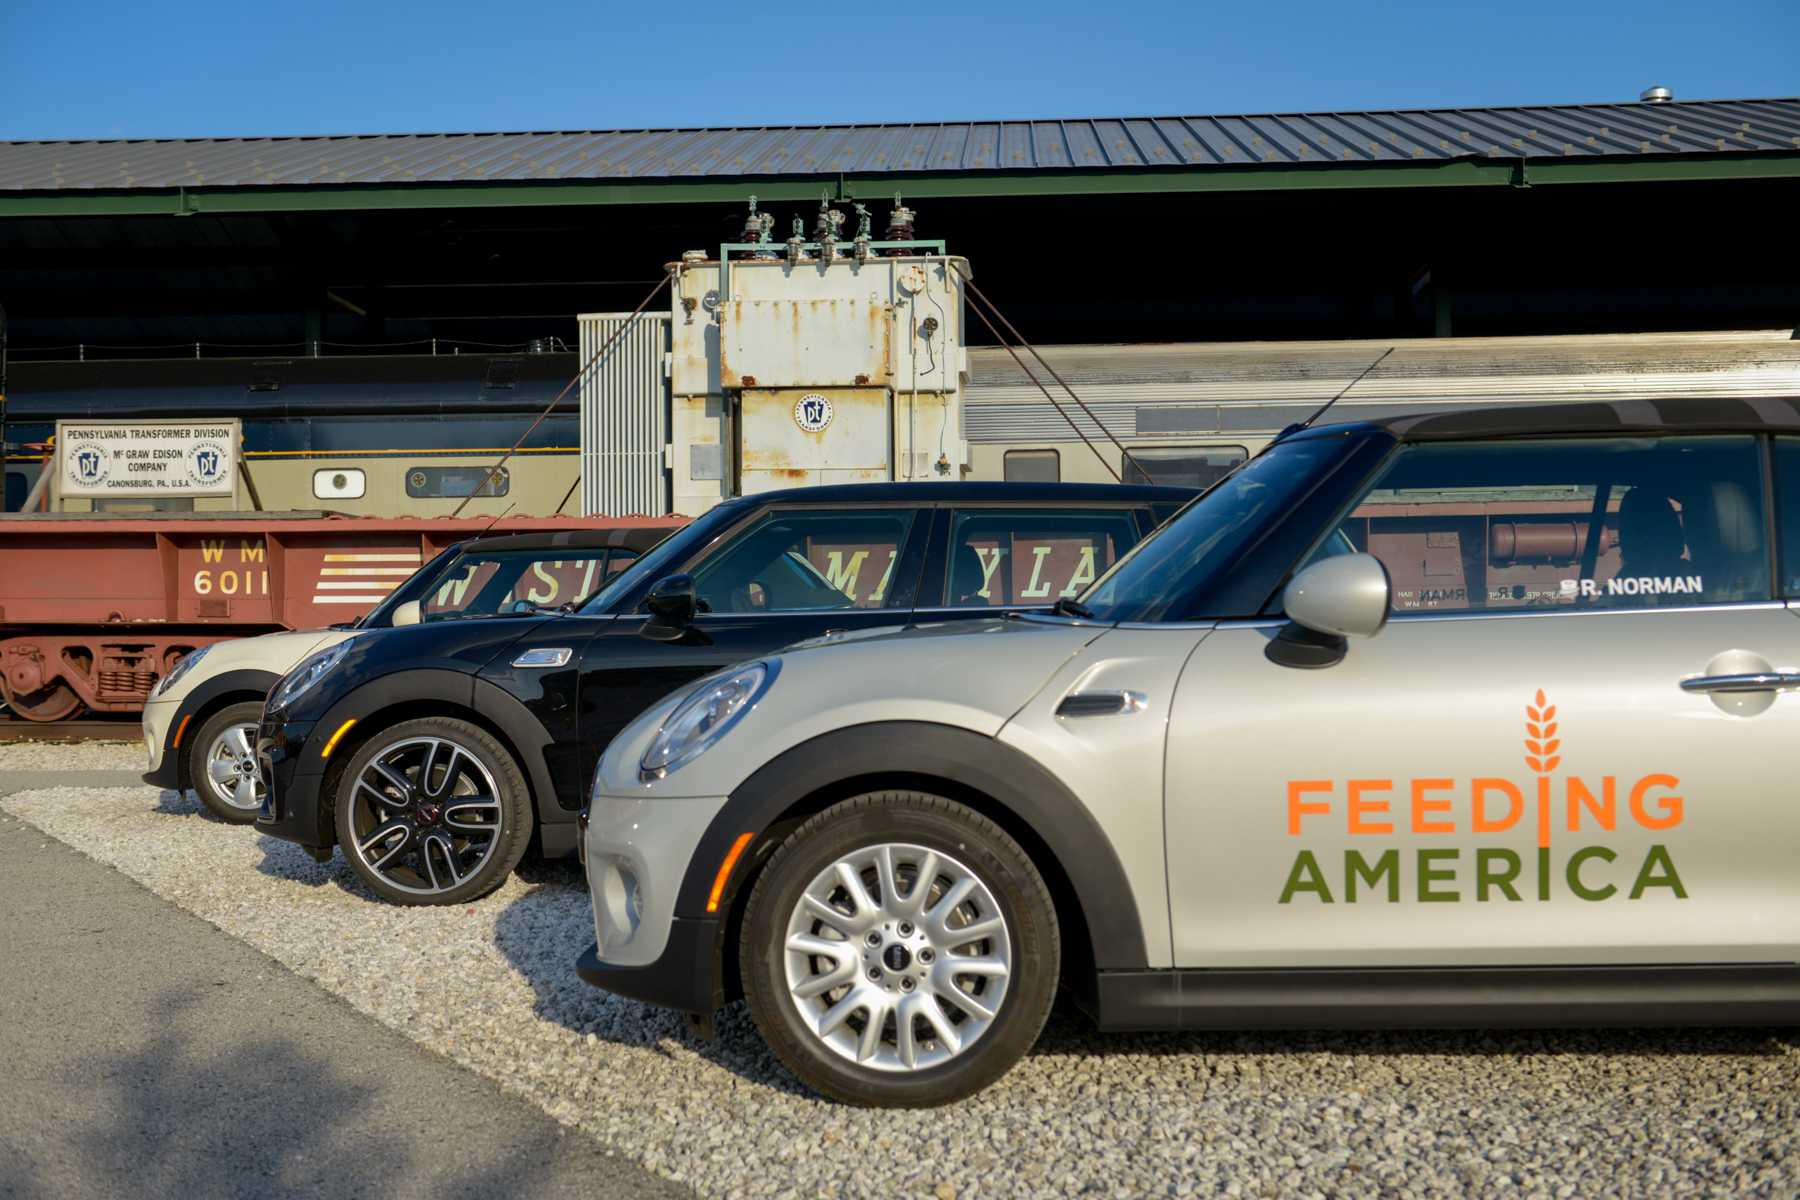 MINI USA CONFIRMS CONTINUED PARTNERSHIP WITH FEEDING AMERICA AS